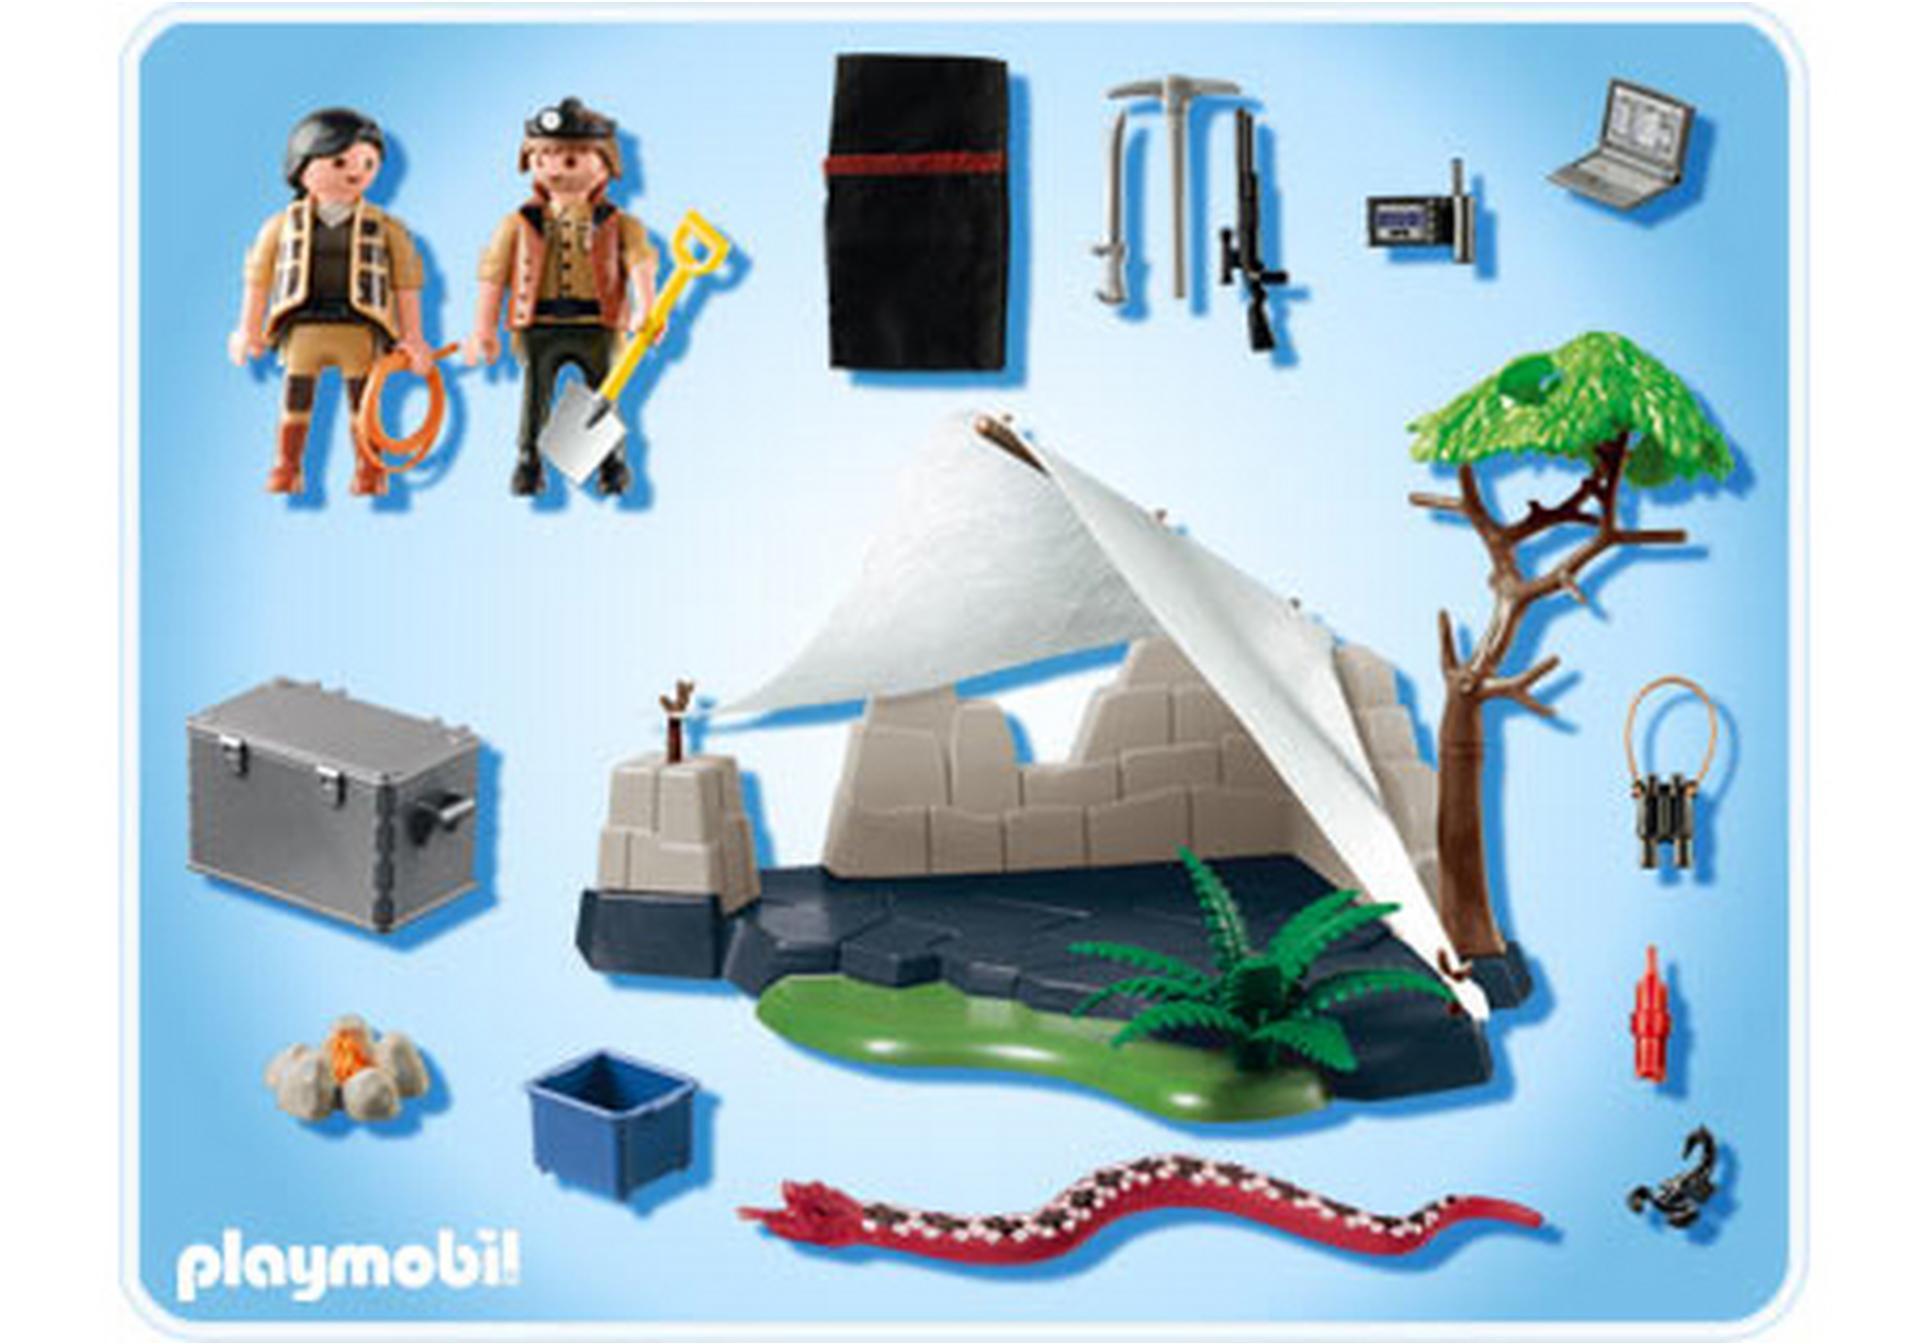 Campement des aventuriers 4843 a playmobil france for Playmobil segunda mano